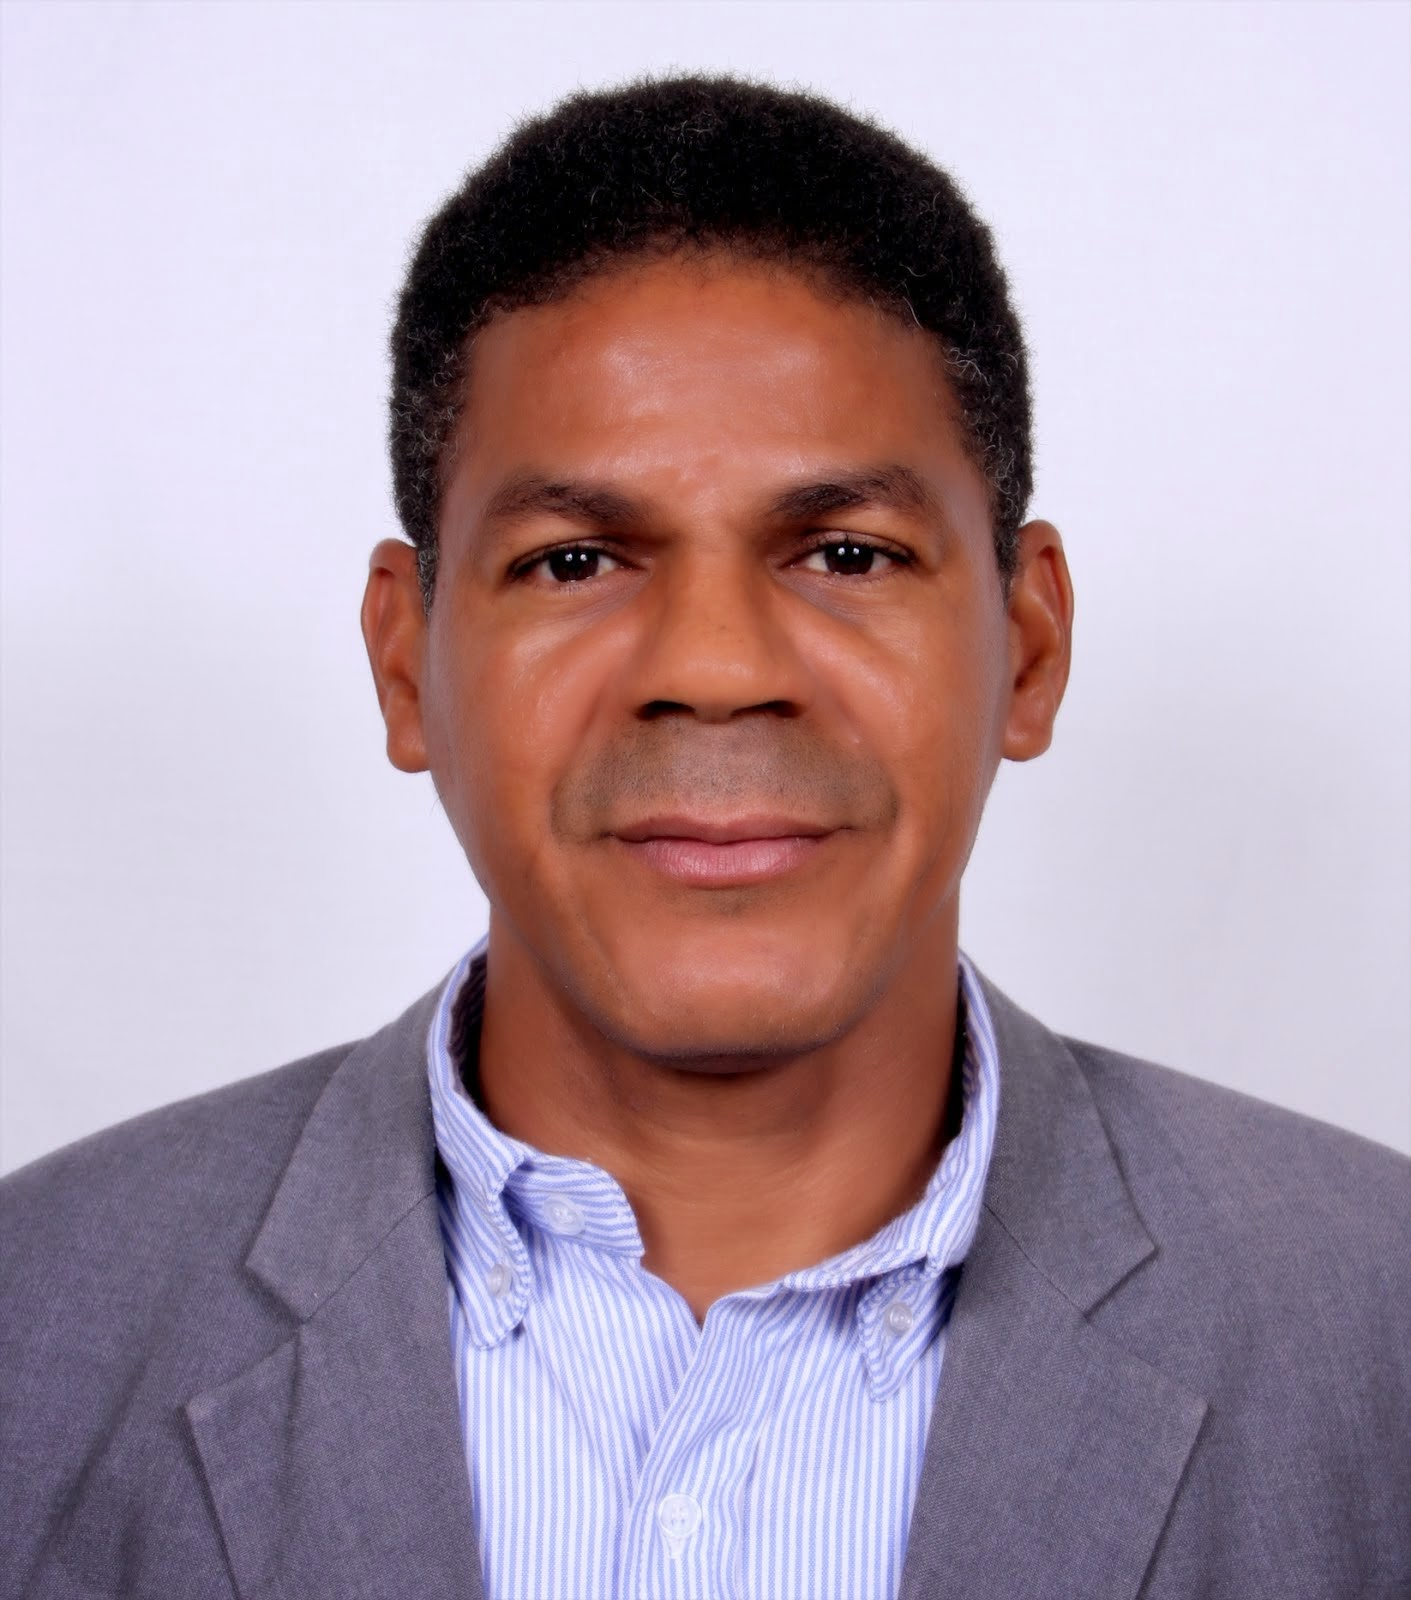 ING. ARCADIO ESTEBAN RODRIGUEZ